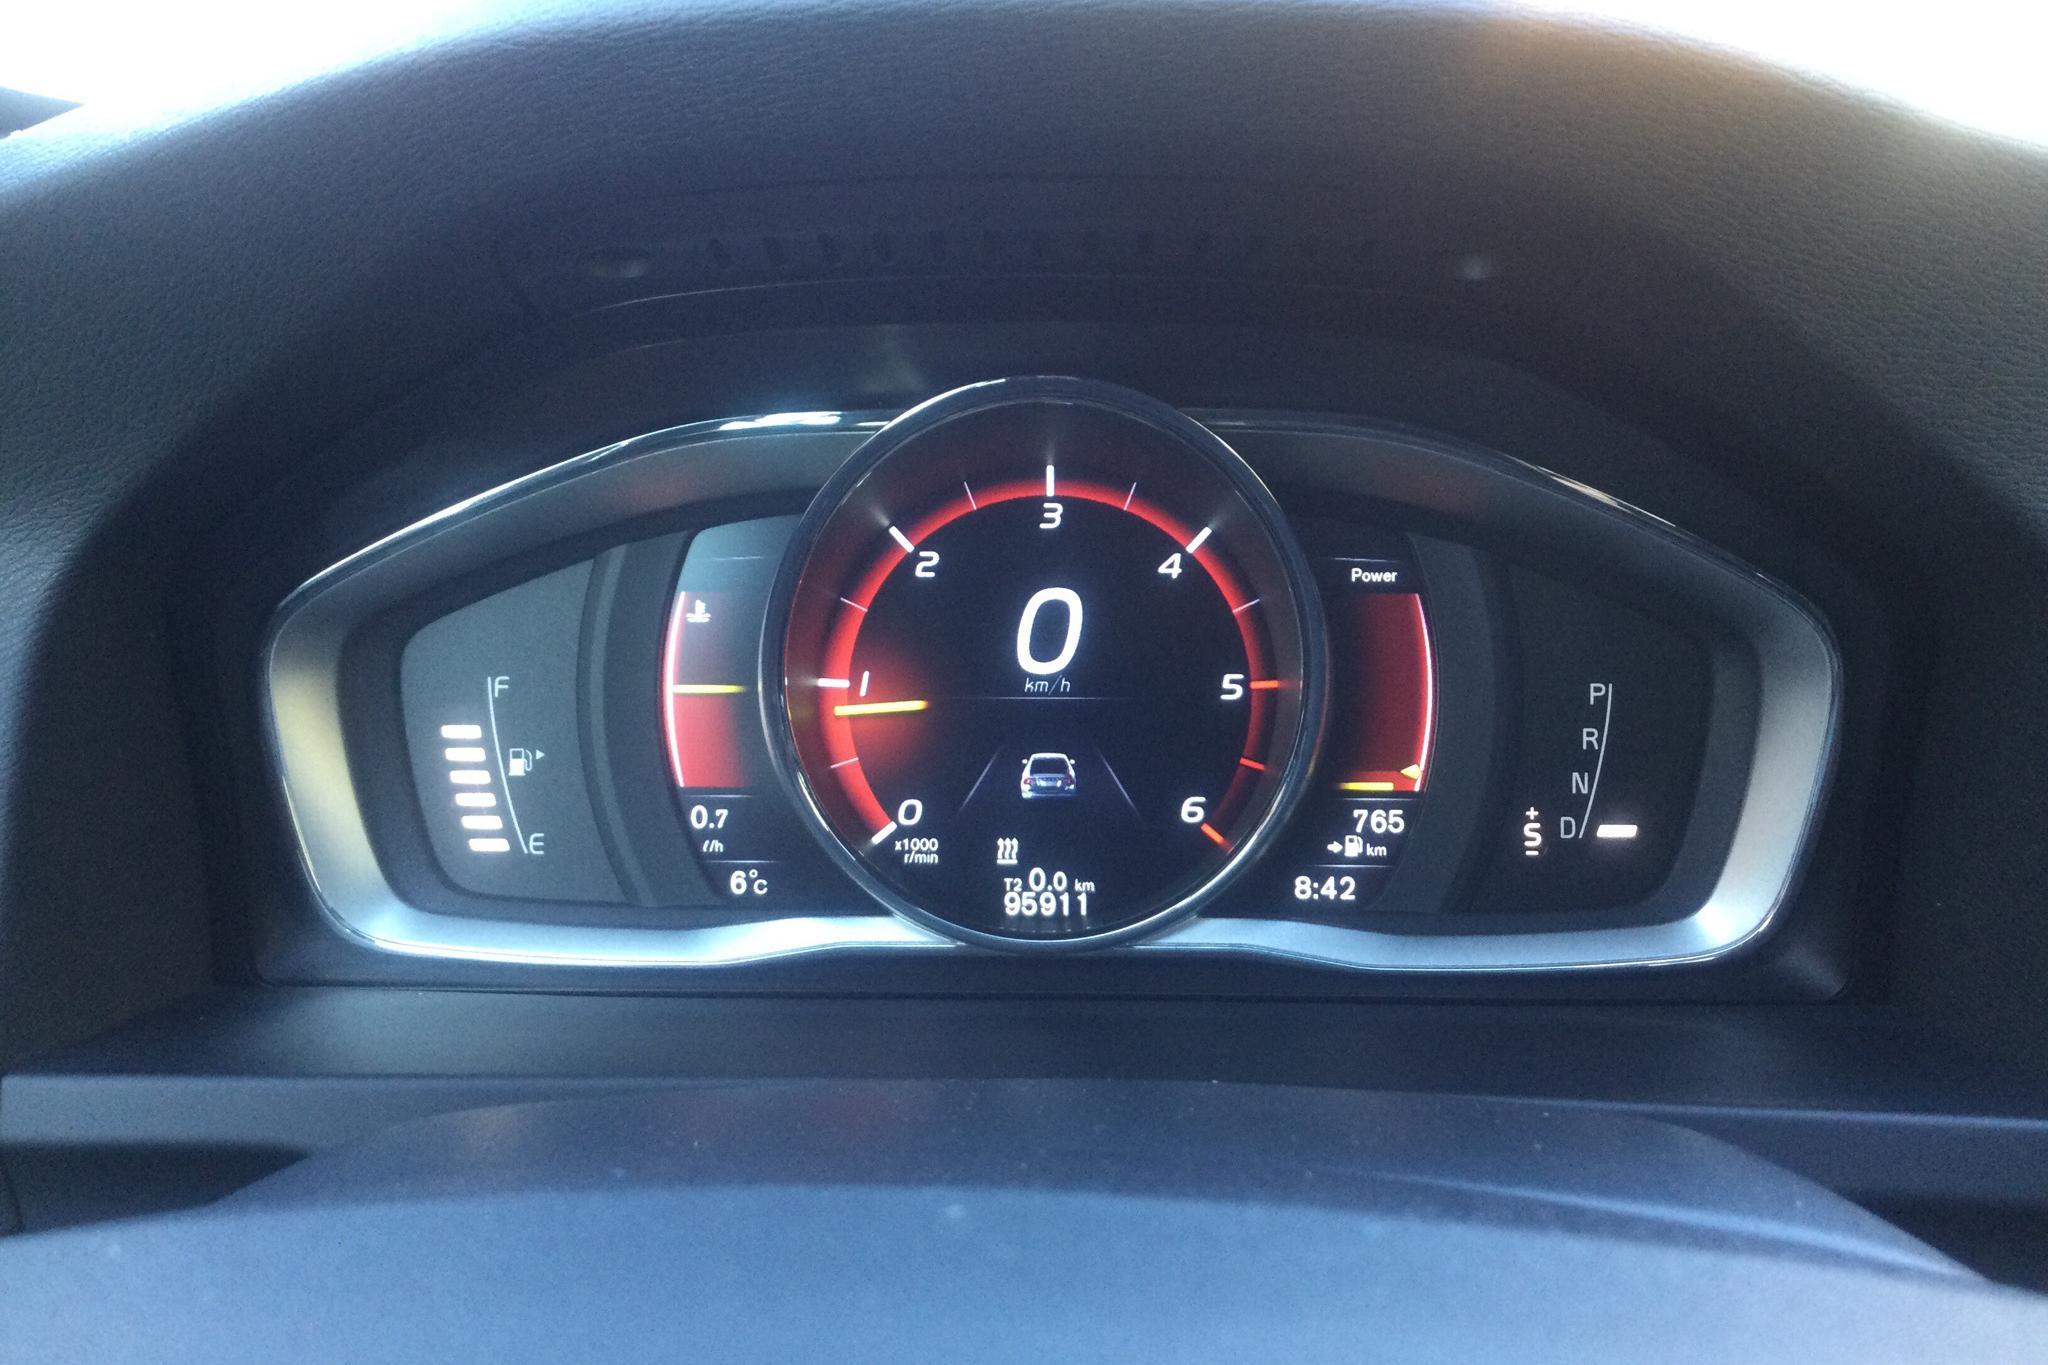 Volvo S60 D4 (190hk) - 95 910 km - Automatic - black - 2016